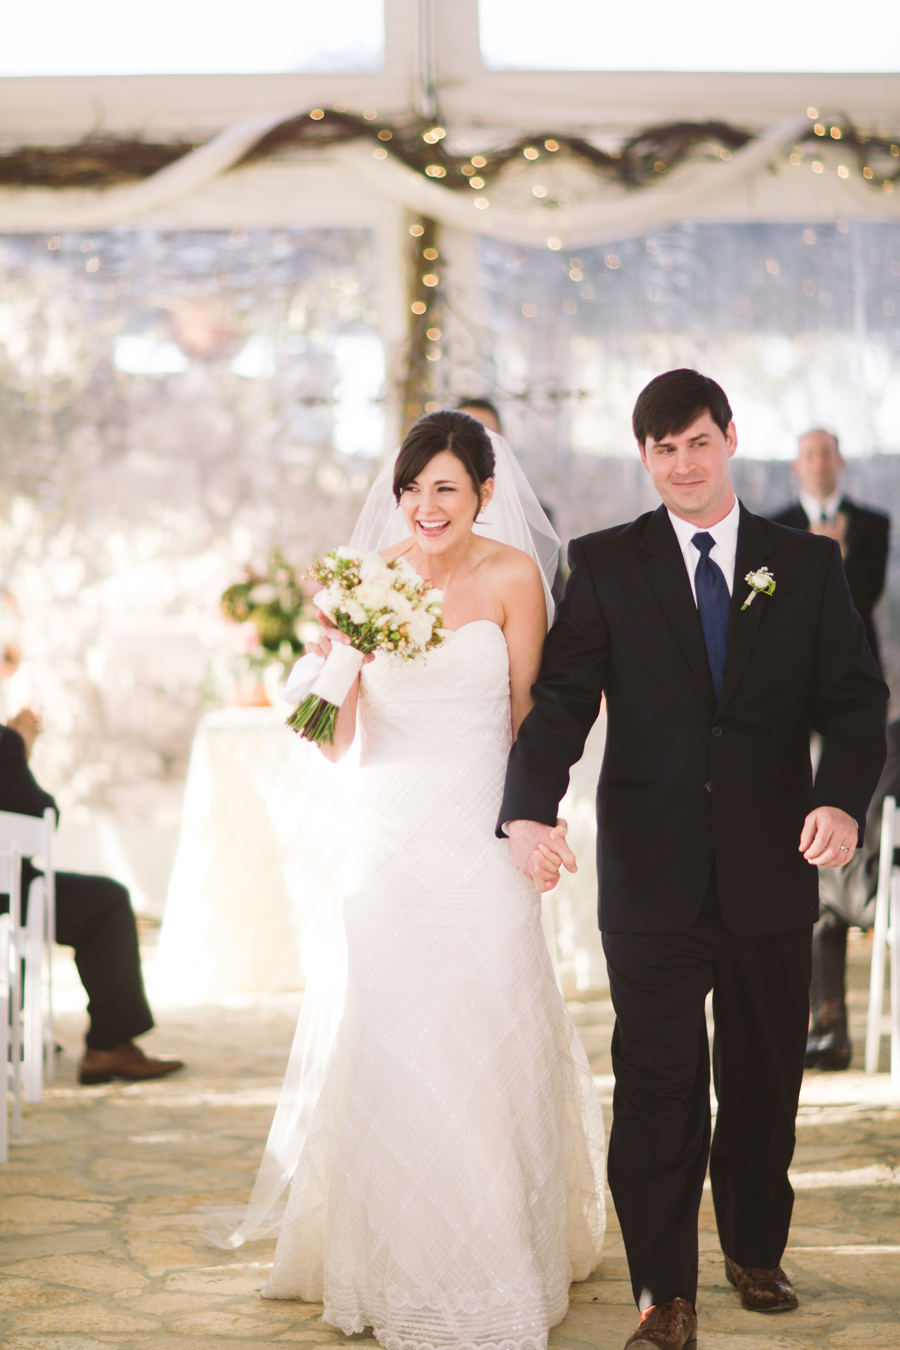 Rancho_Mirando_wedding_16